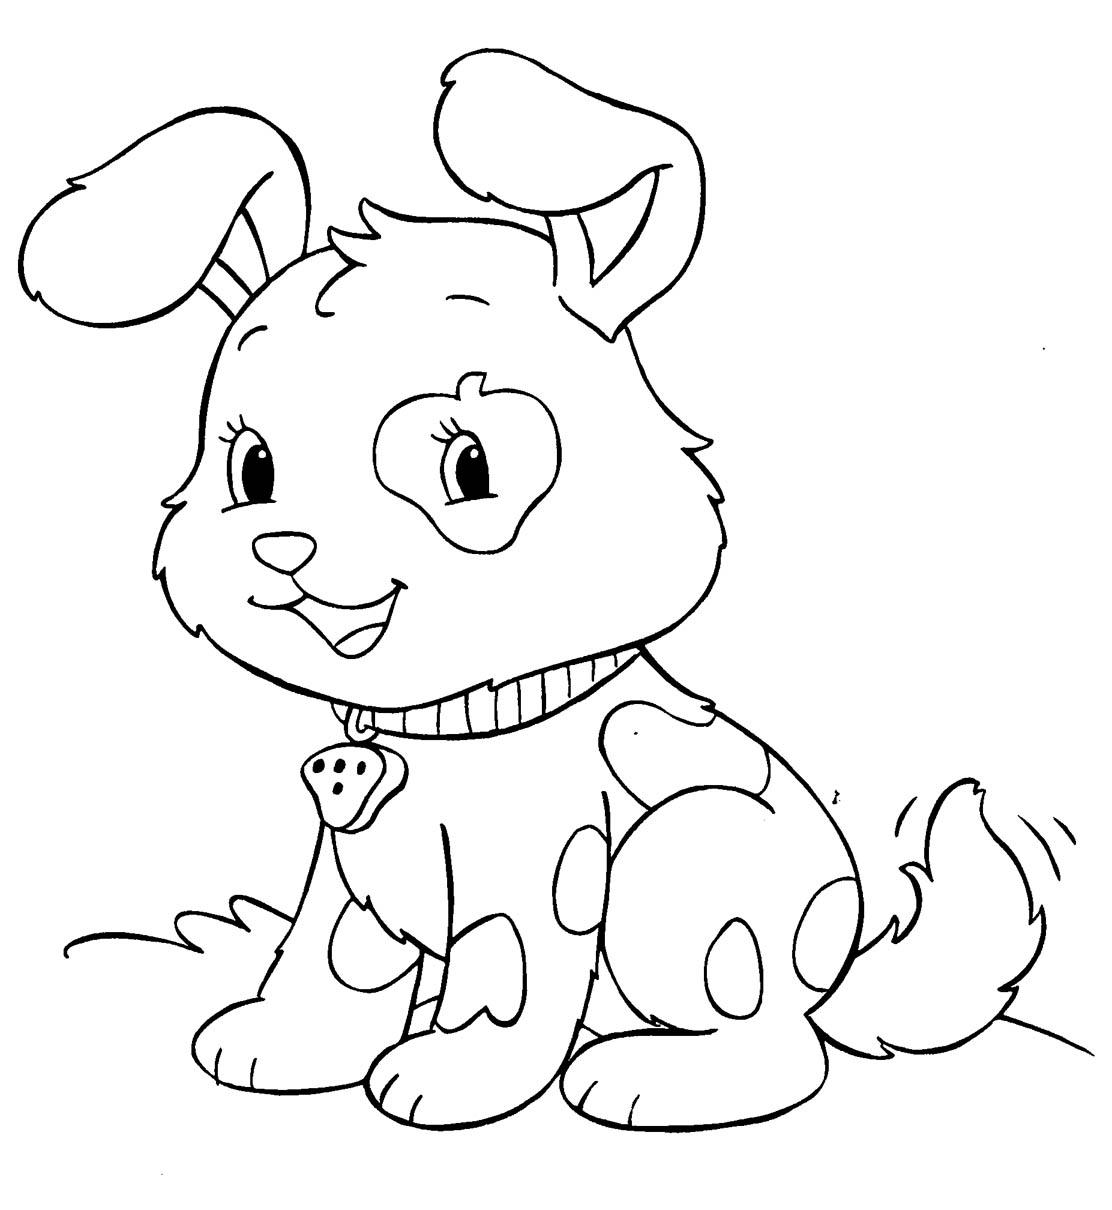 Pies Psy Kolorowanki